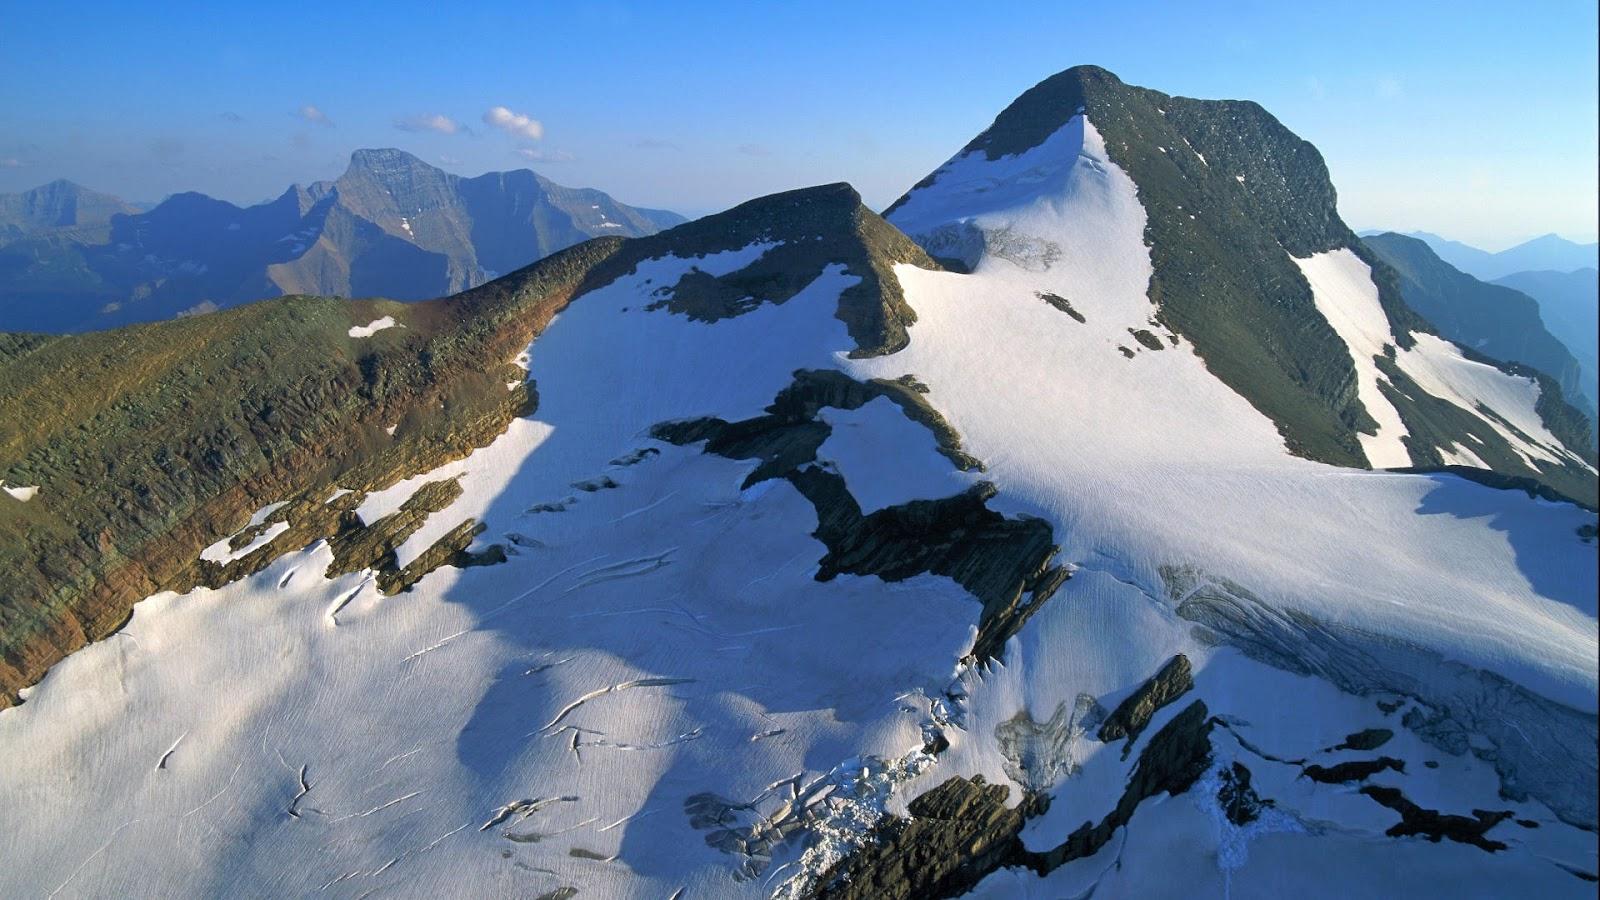 http://4.bp.blogspot.com/-R7nJSK0DllM/UIdqMJyvfvI/AAAAAAAABuI/3io2Kxmpa9U/s1600/Glacier+National+Park+USA.jpg